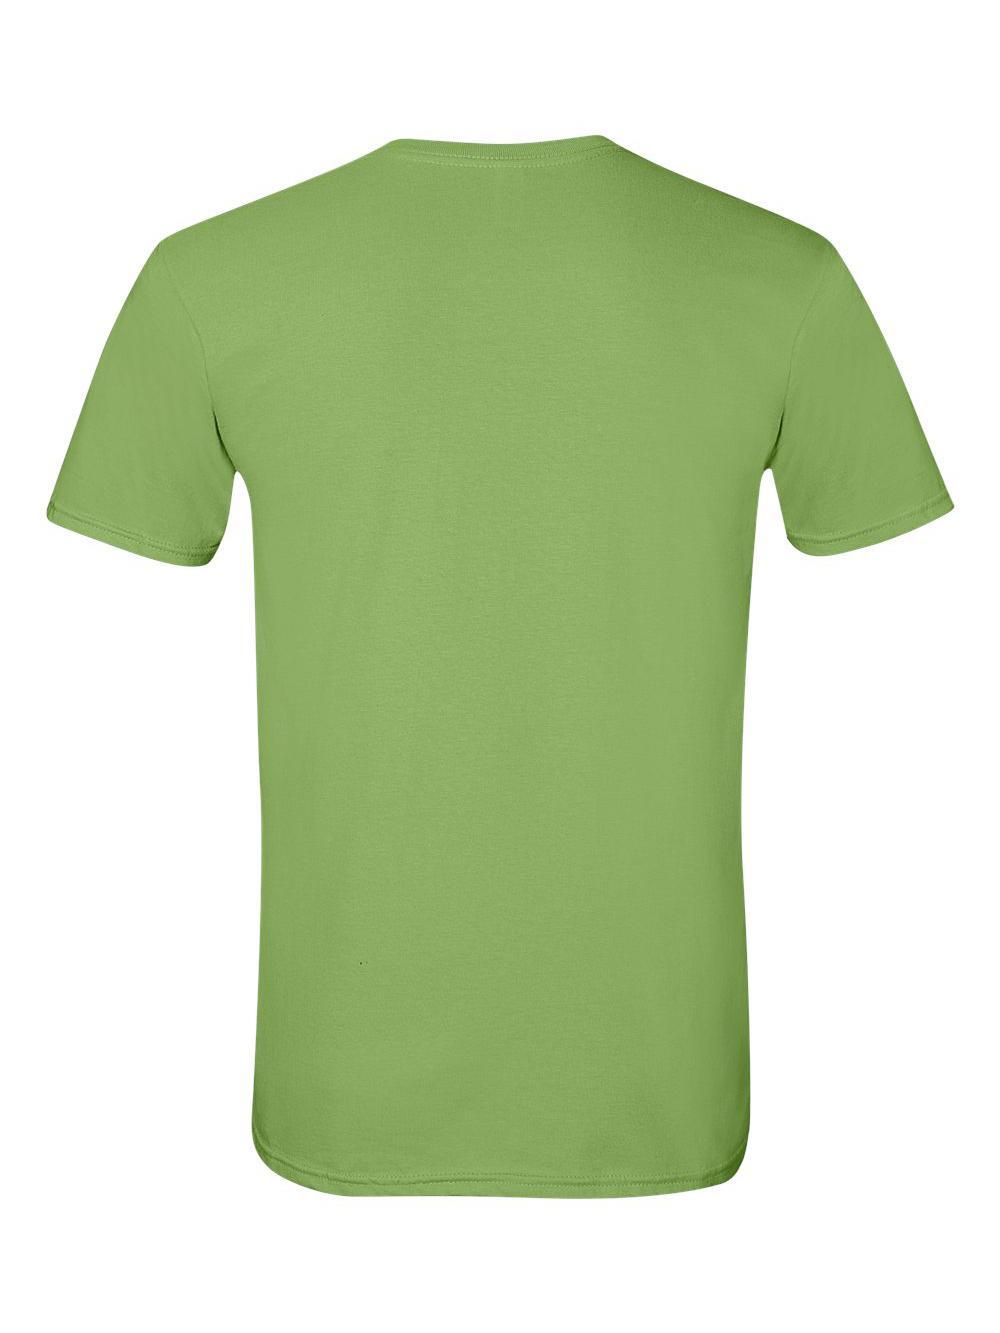 Gildan-Softstyle-T-Shirt-64000 thumbnail 118